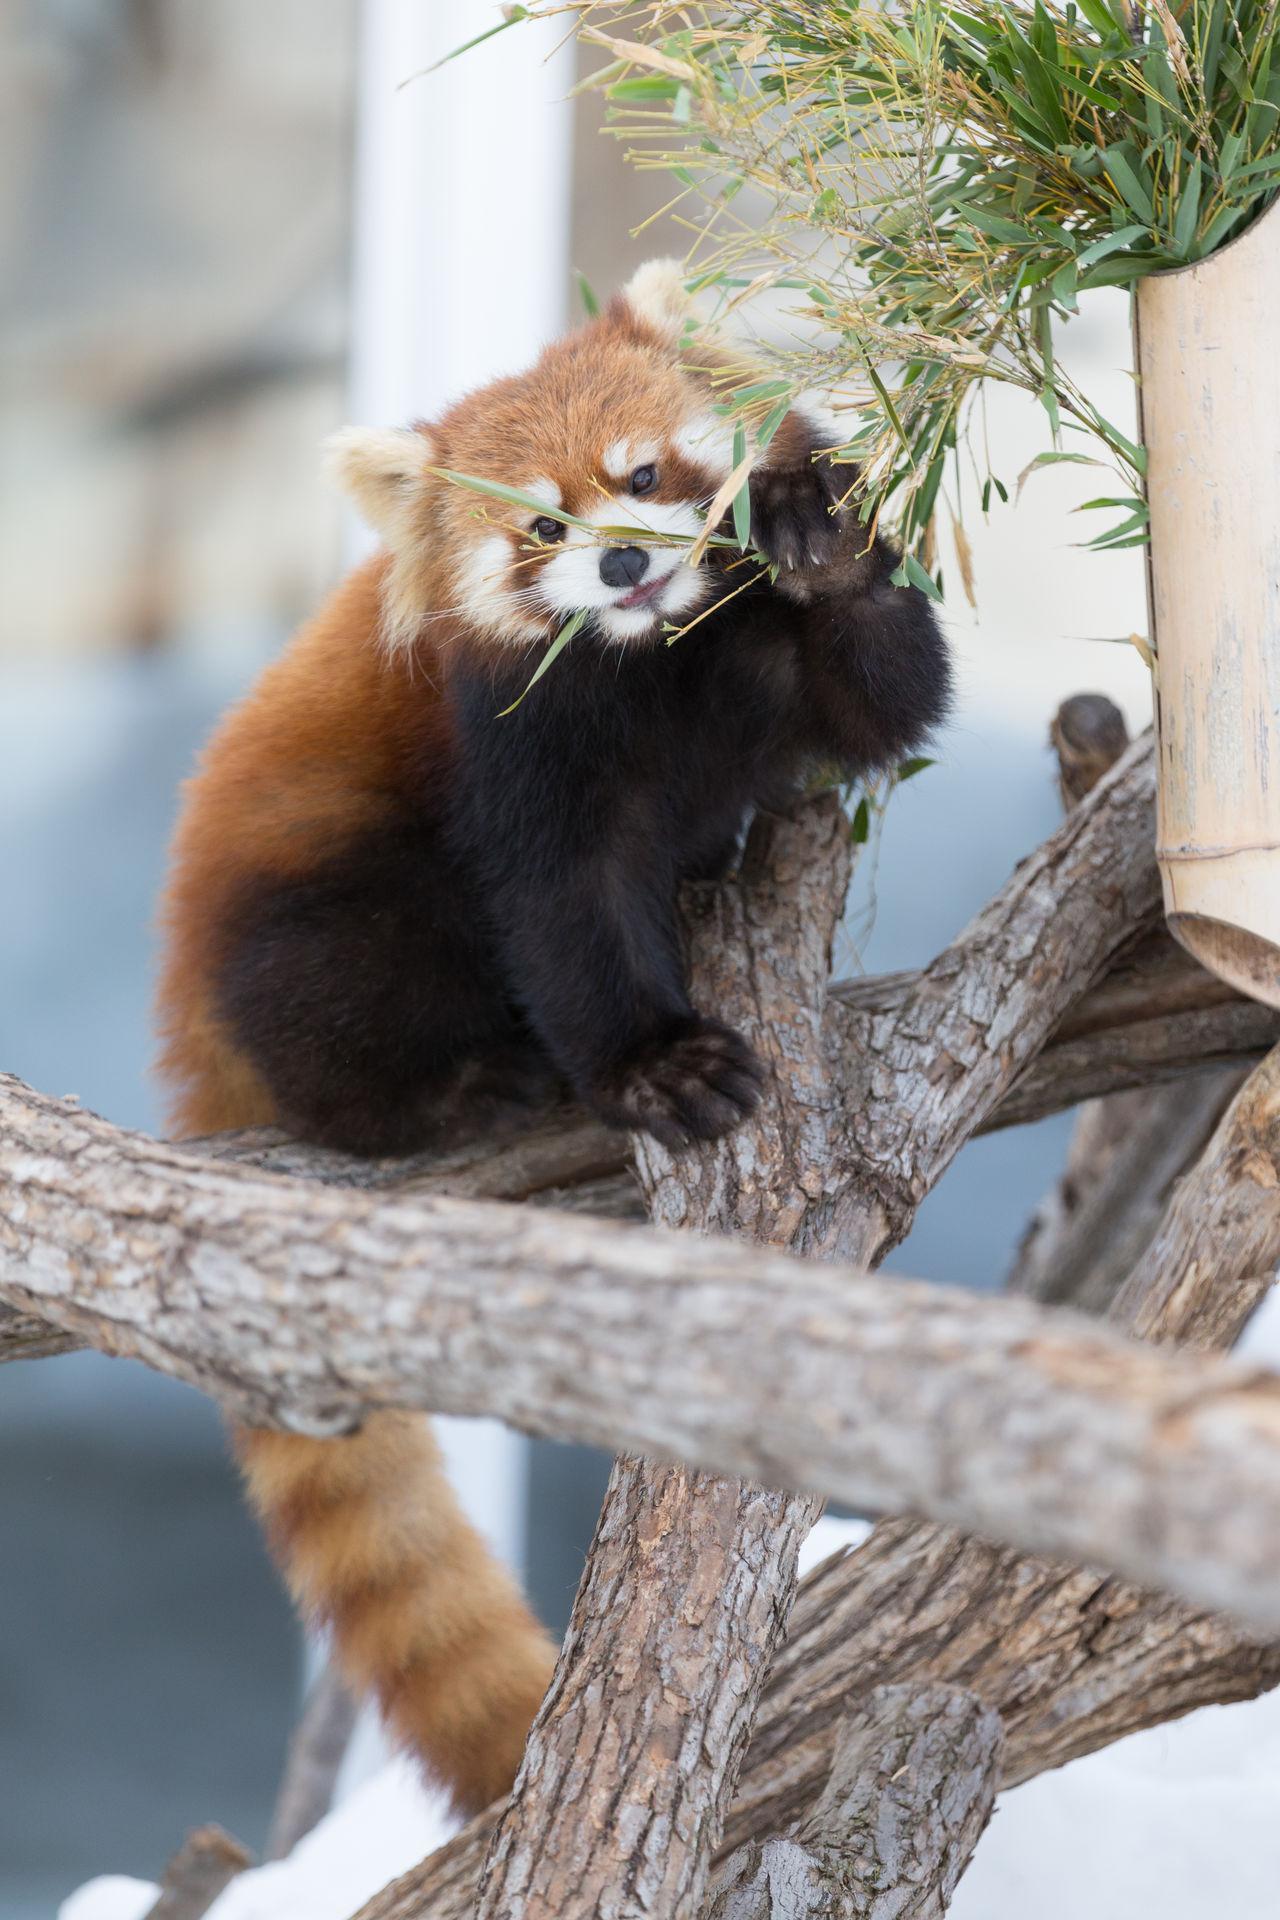 Ailurus Fulgens Animal Animal Themes Animals Branch Climbing Day Lesser Panda Mammal Nature No People One Animal Outdoors Red Panda Redpanda Tree Zoo